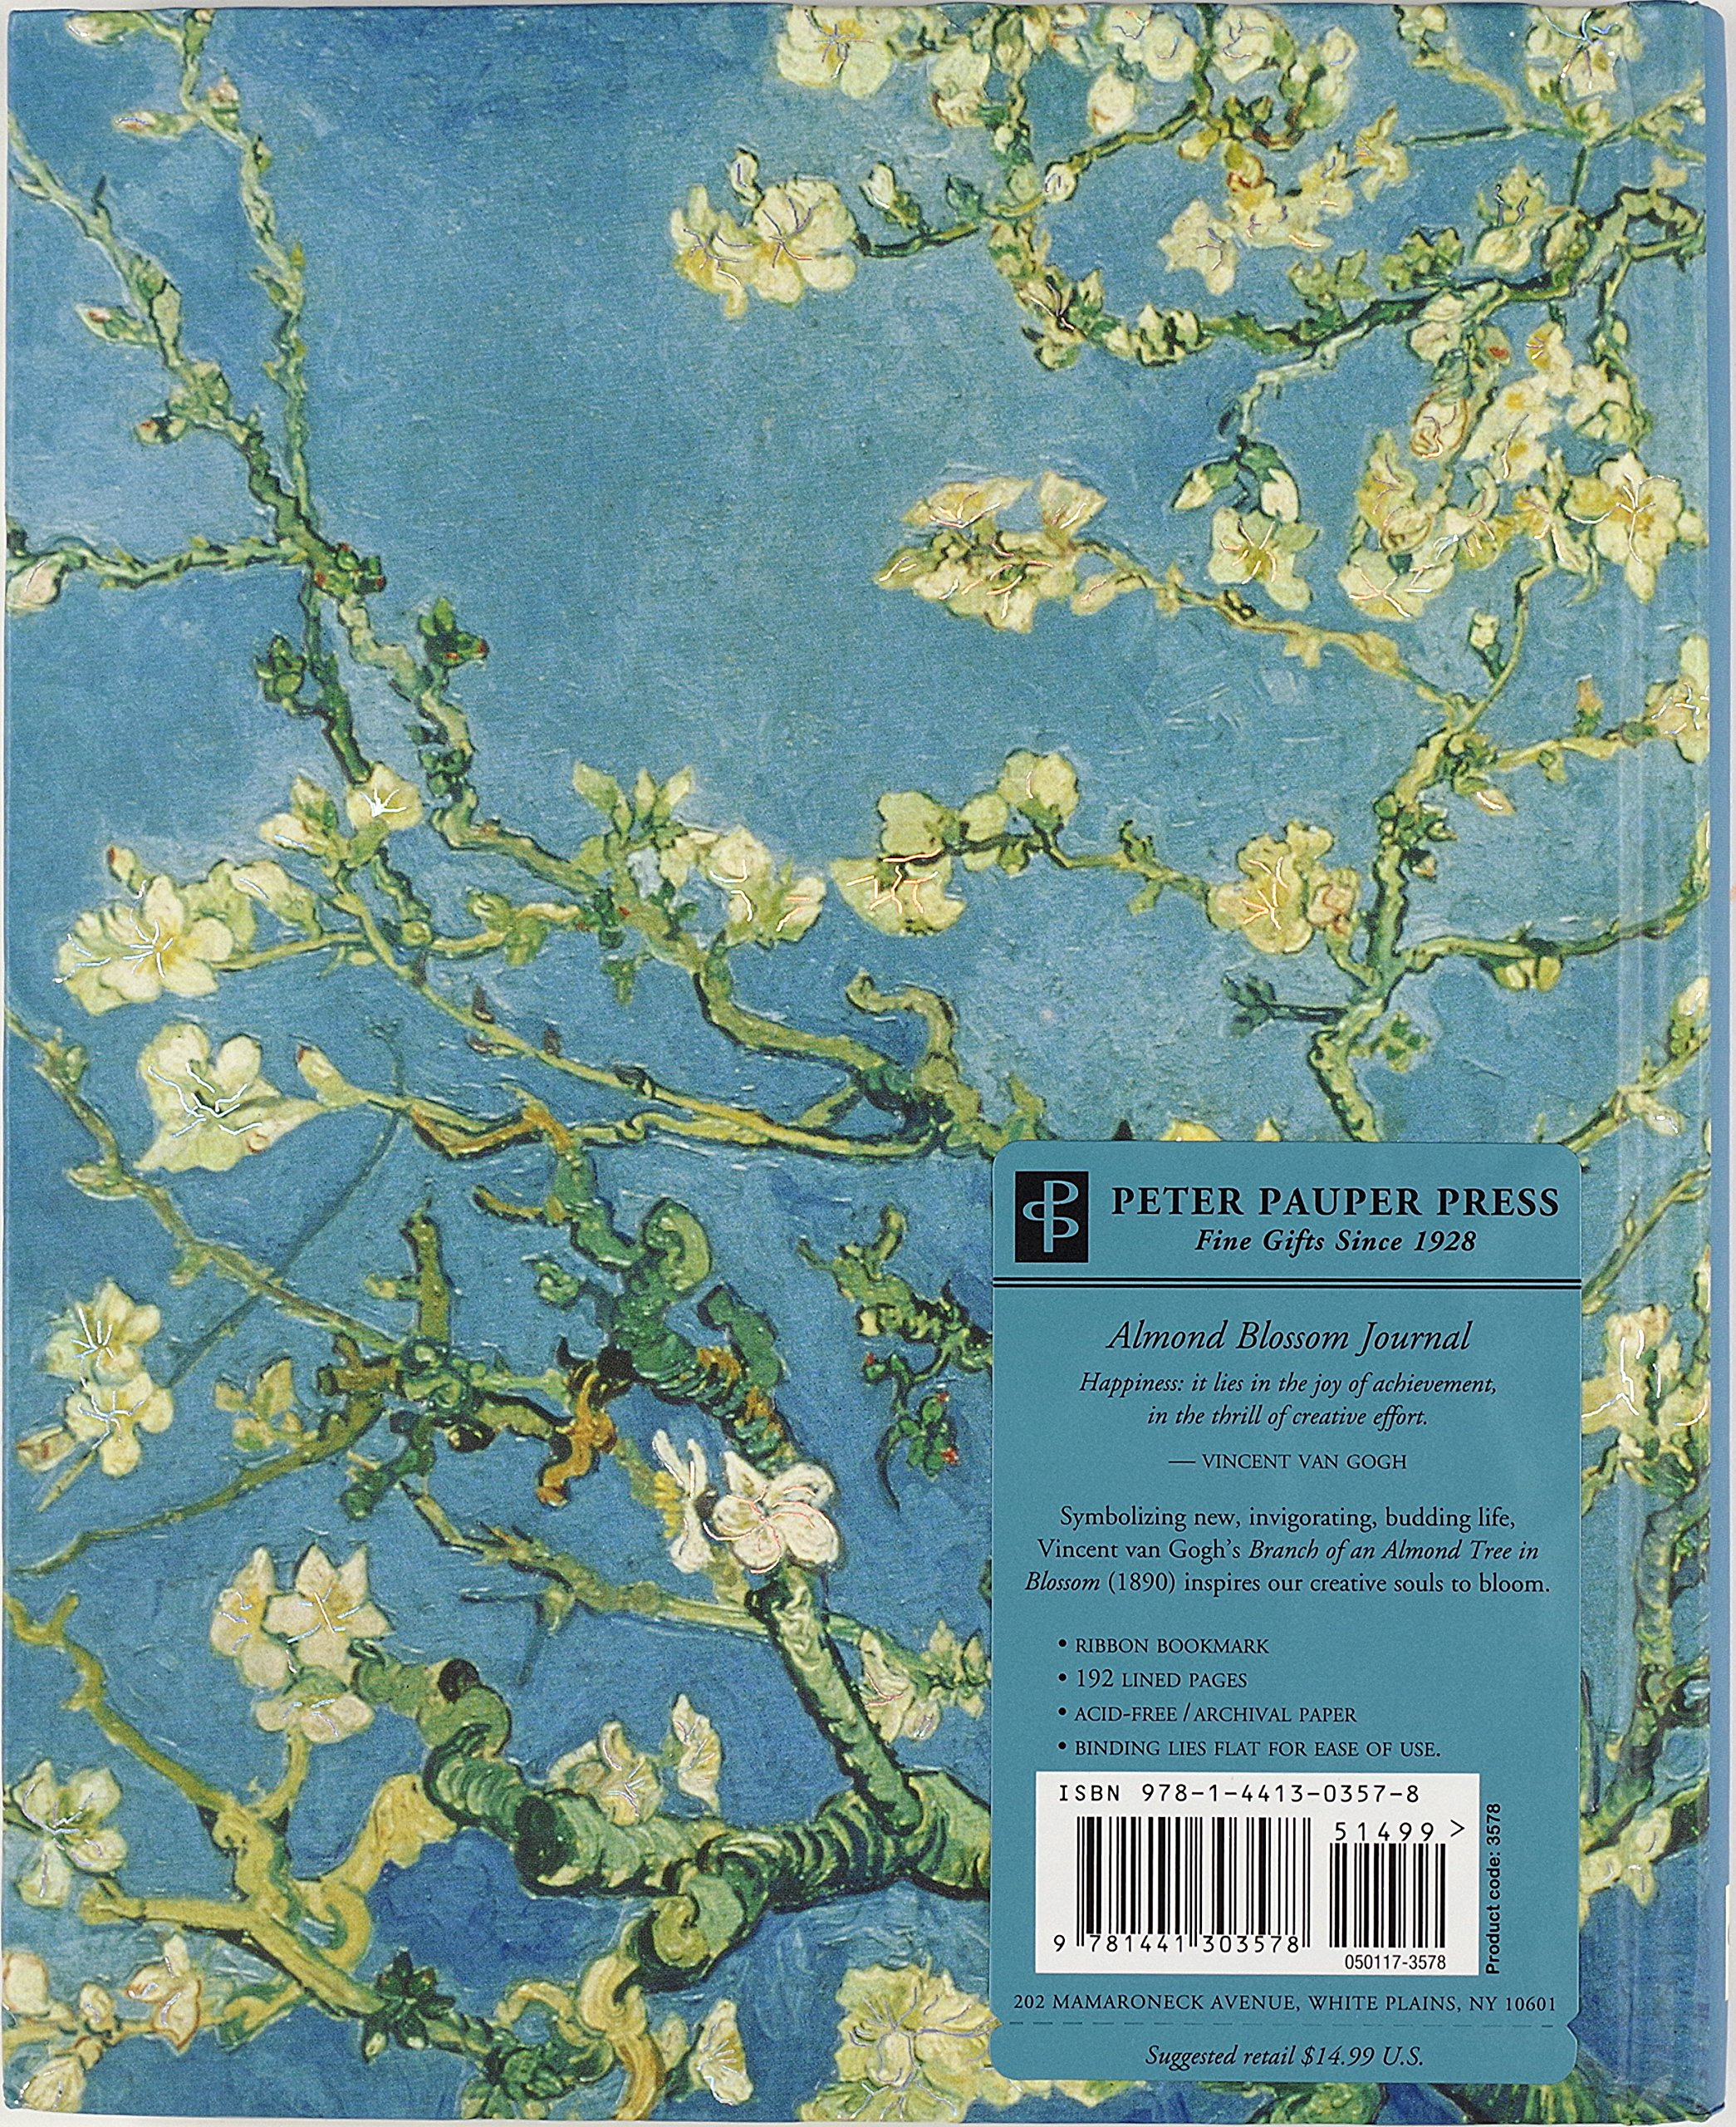 Almond Blossom Journal Notebook Diary Peter Pauper Press